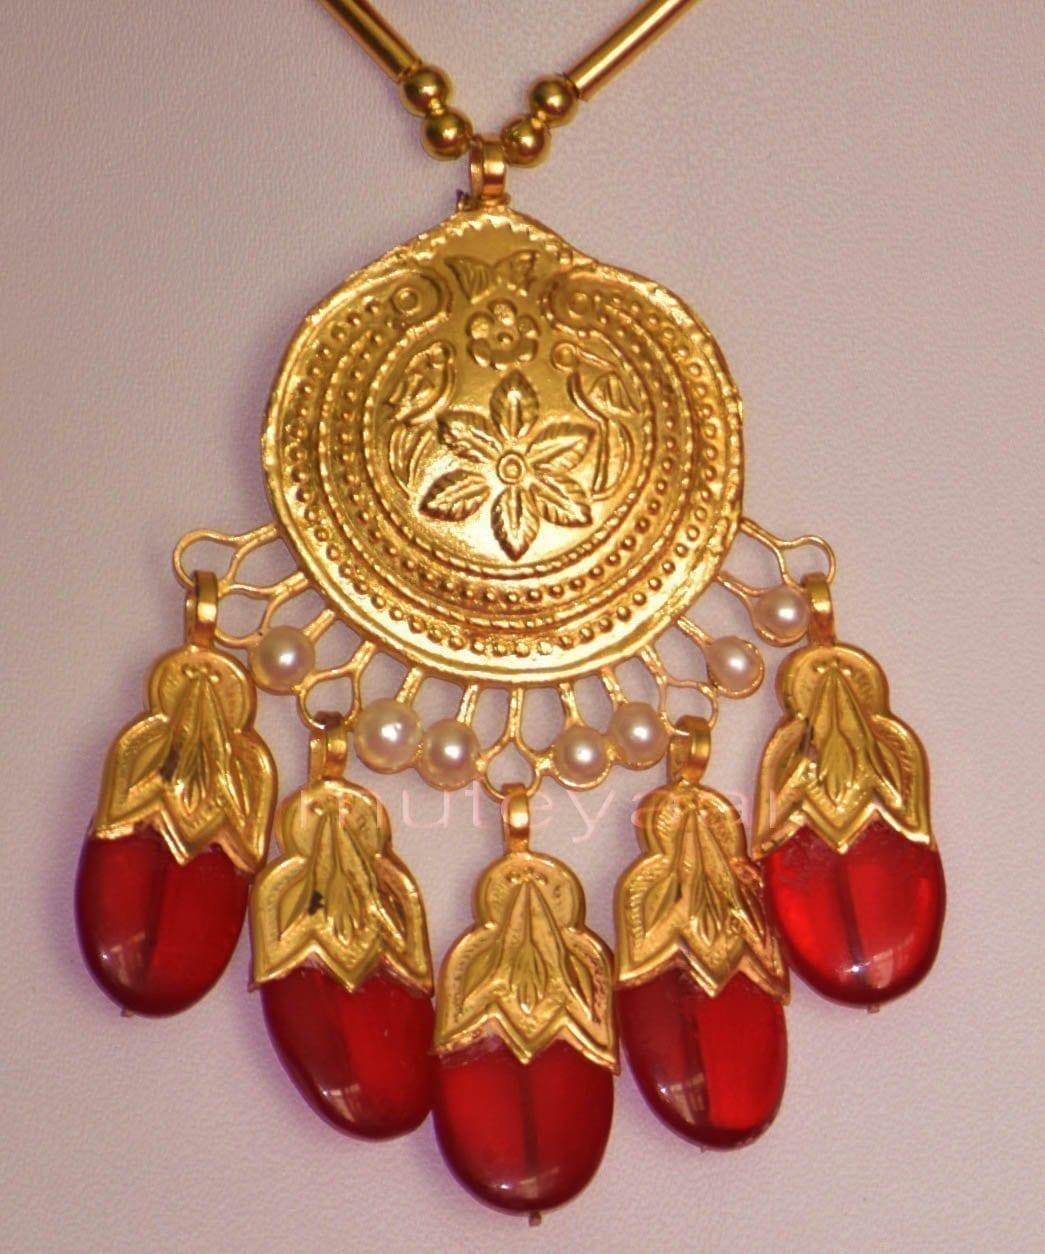 24 Ct. Gold Plated Traditional Punjabi Dakh Set jewellery with Tikka  J0210 4